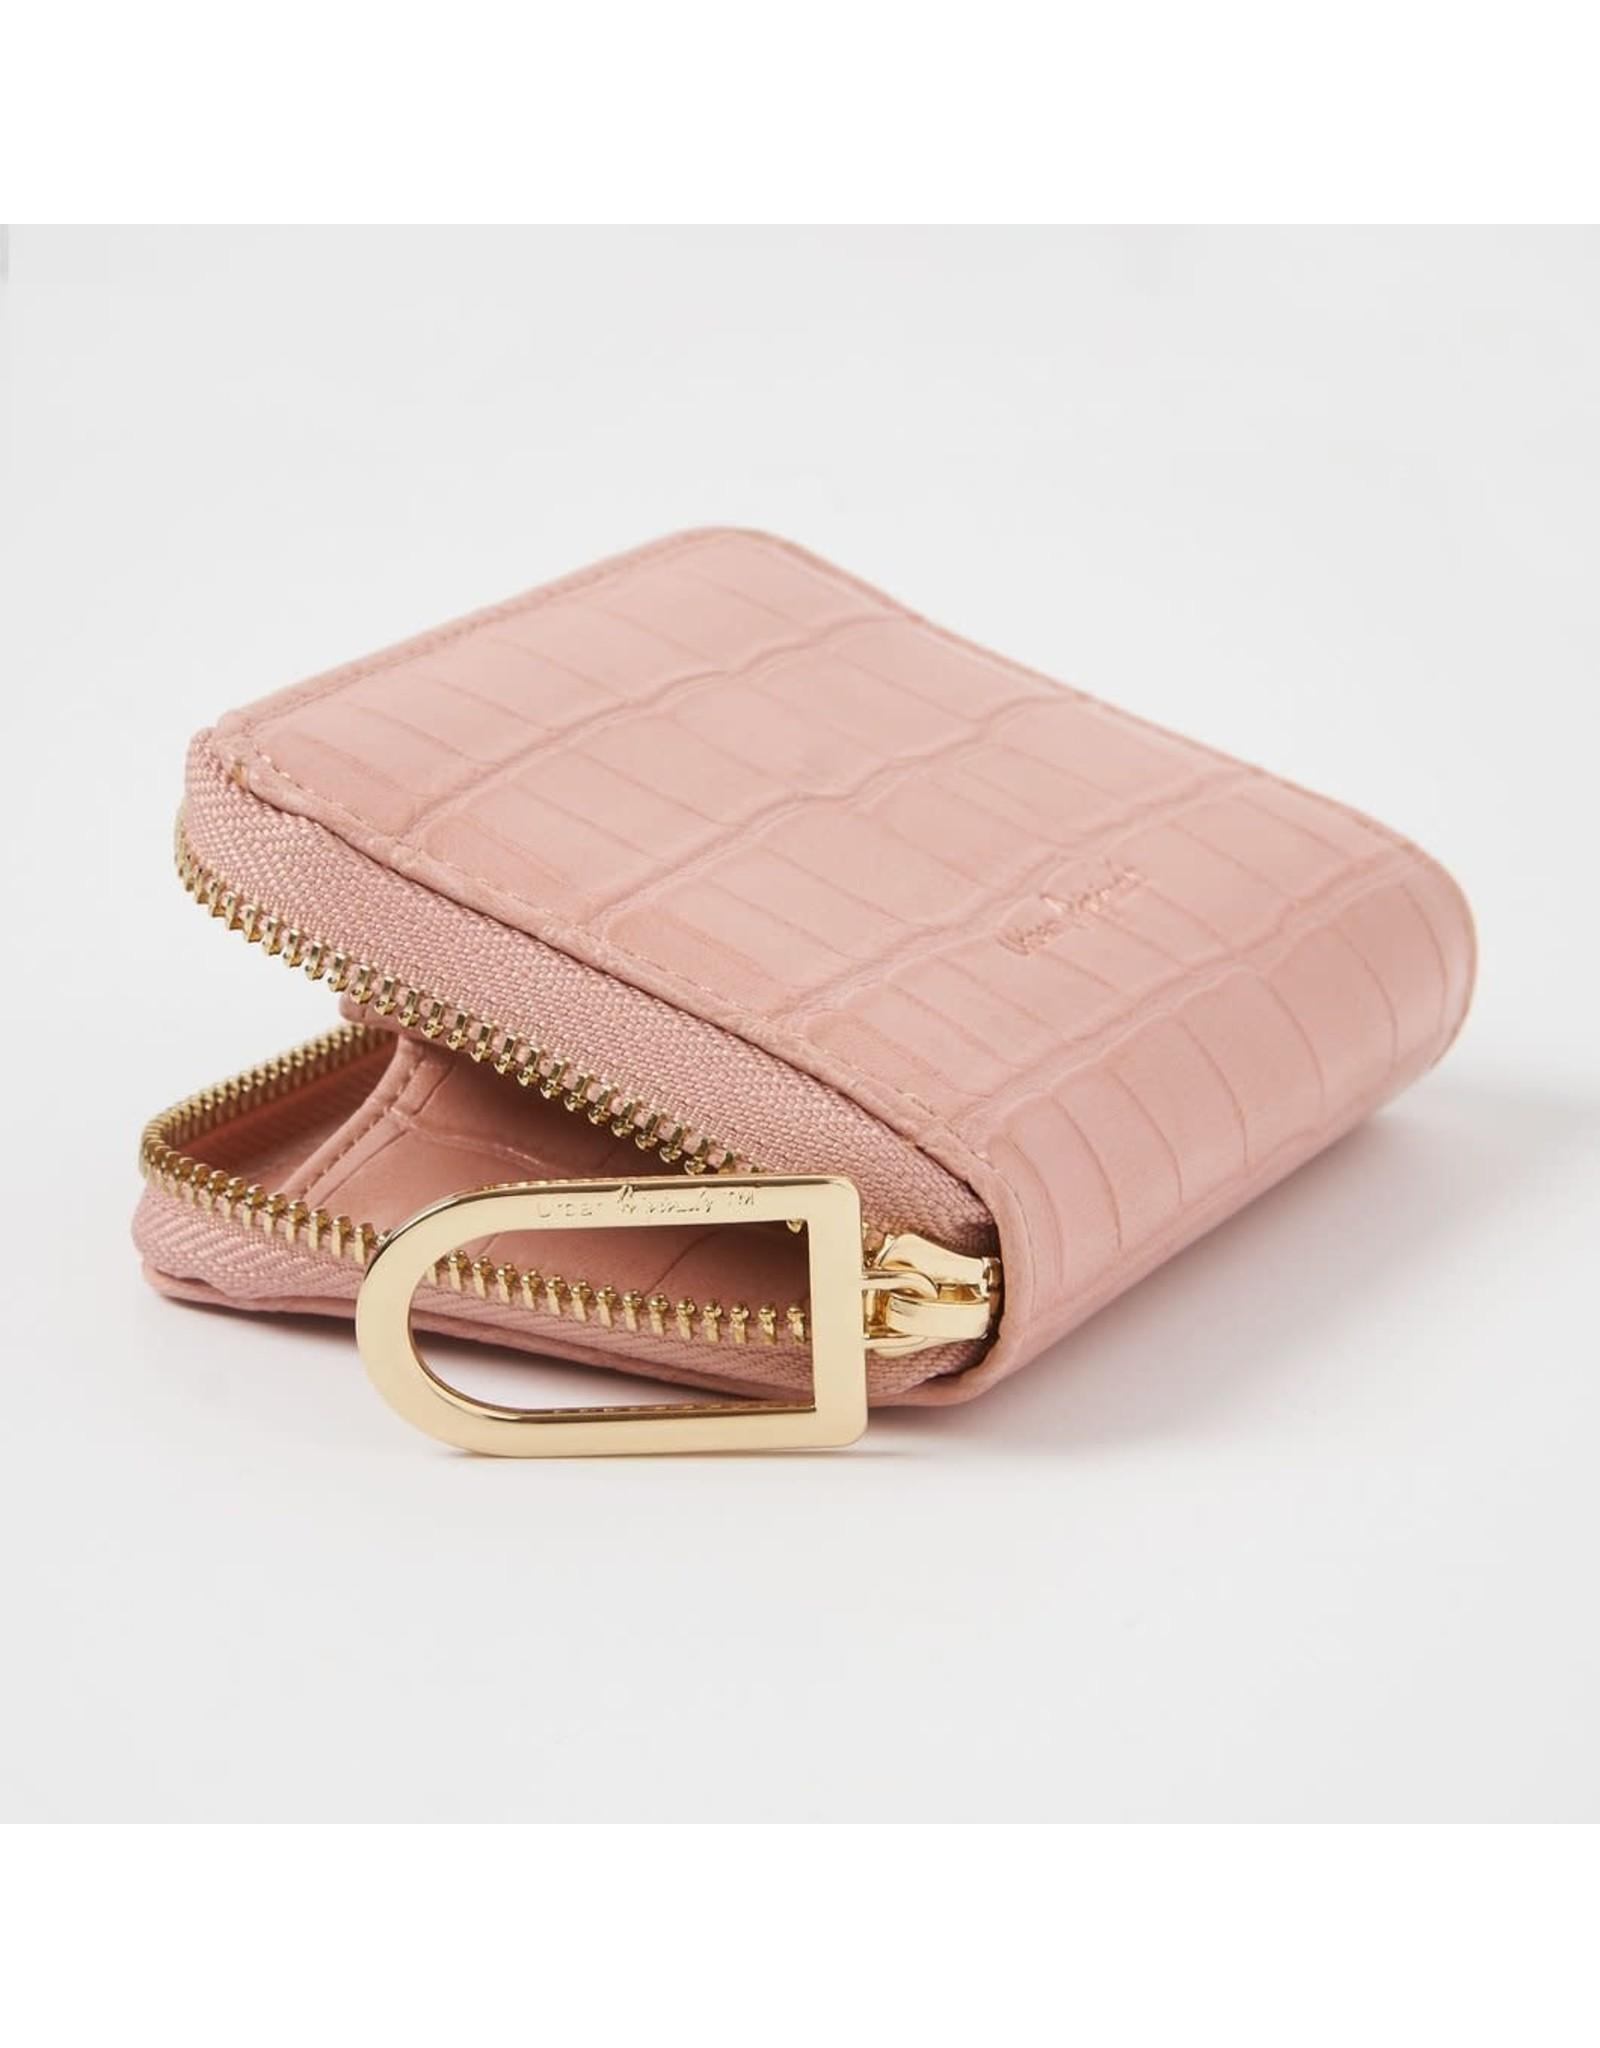 Urban Originals Essentials Pink Croc Wallet